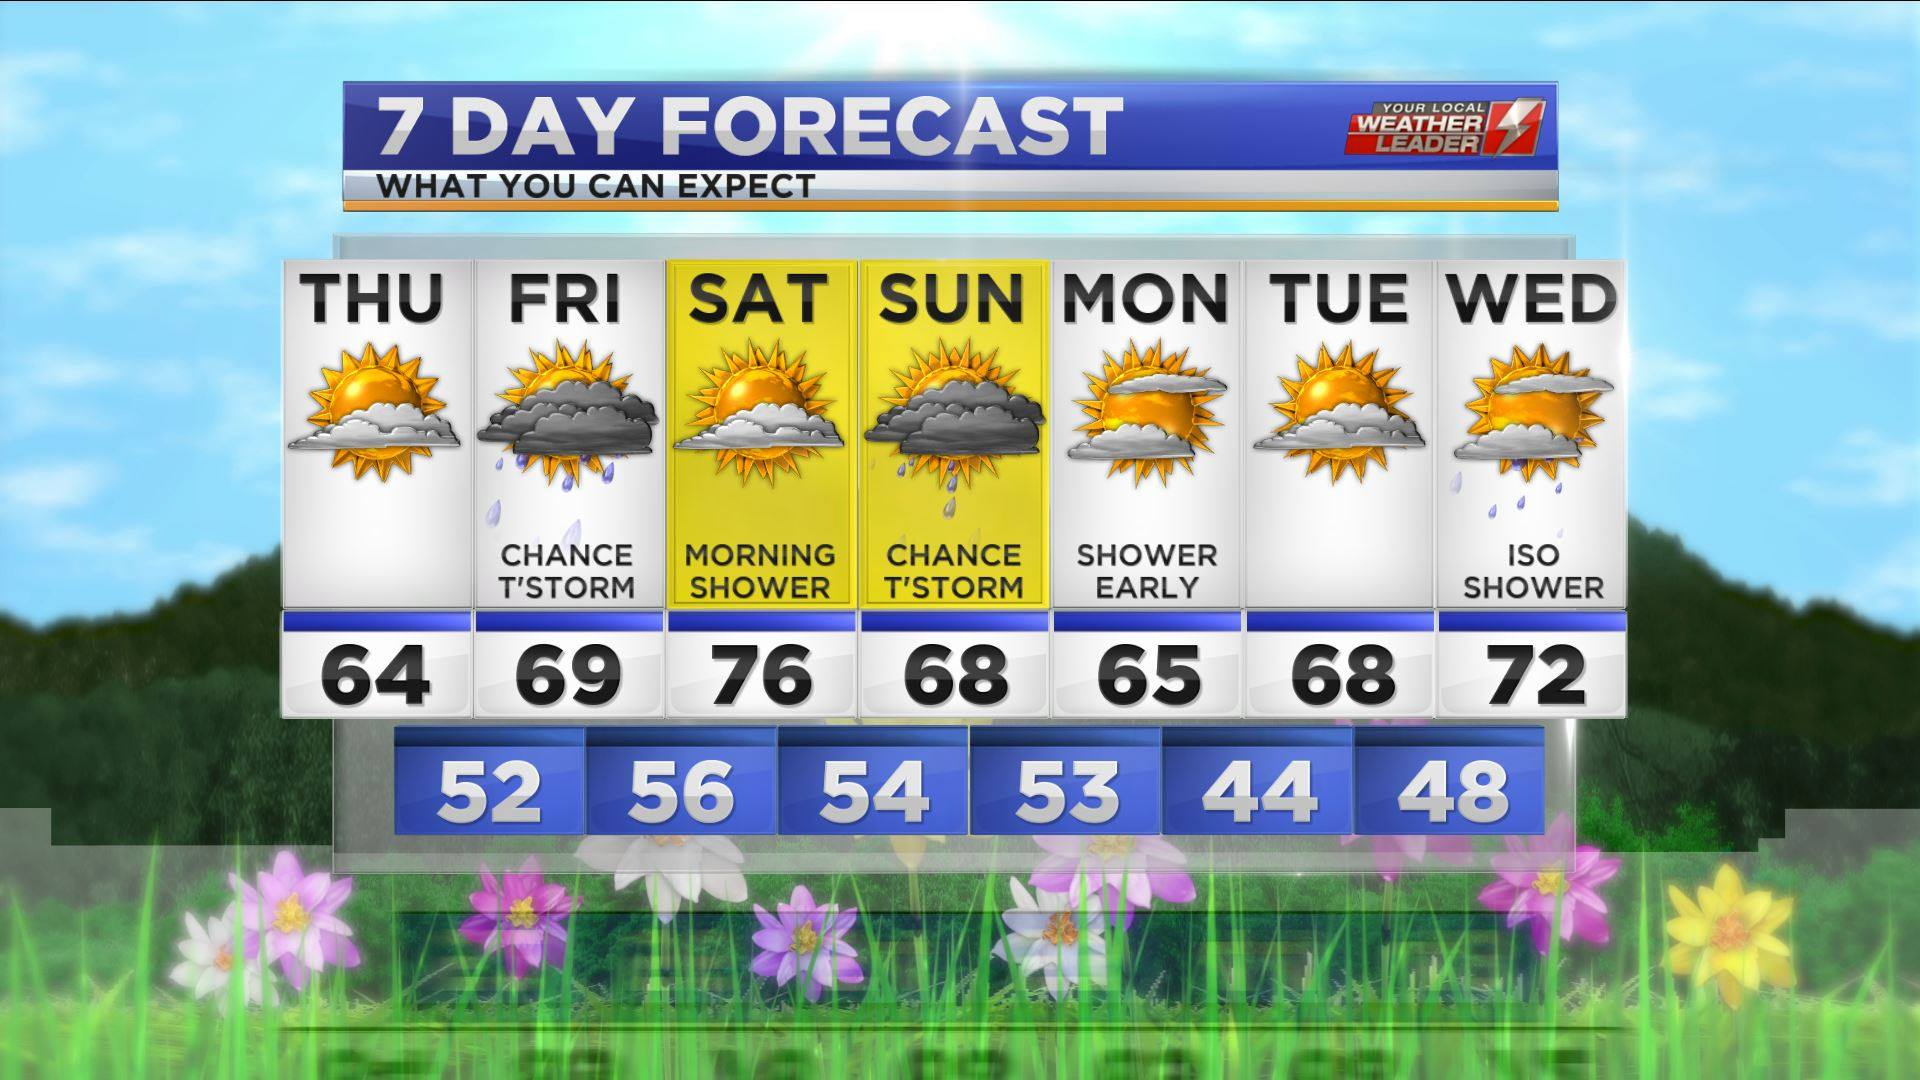 Your 7-day Forecast for Thursday 11 April 2019